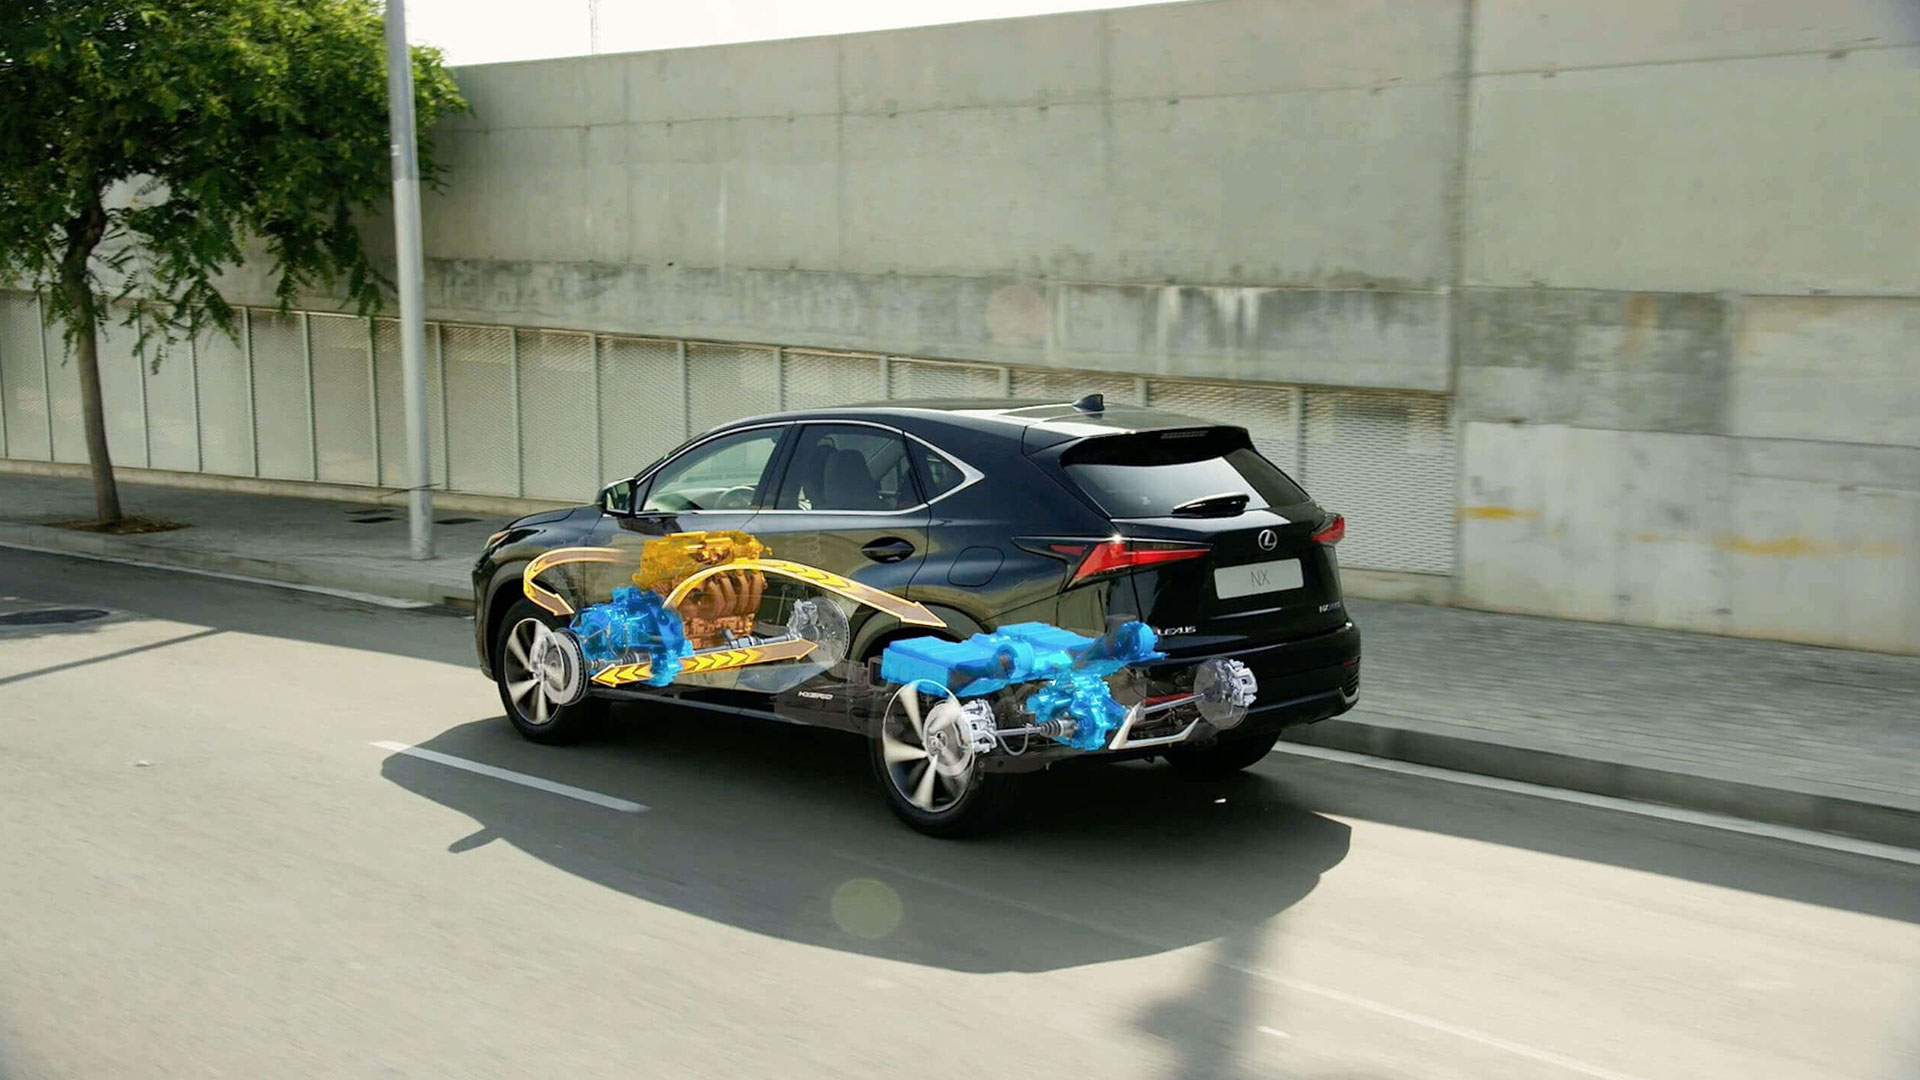 6 Lexus self charging hybrid image